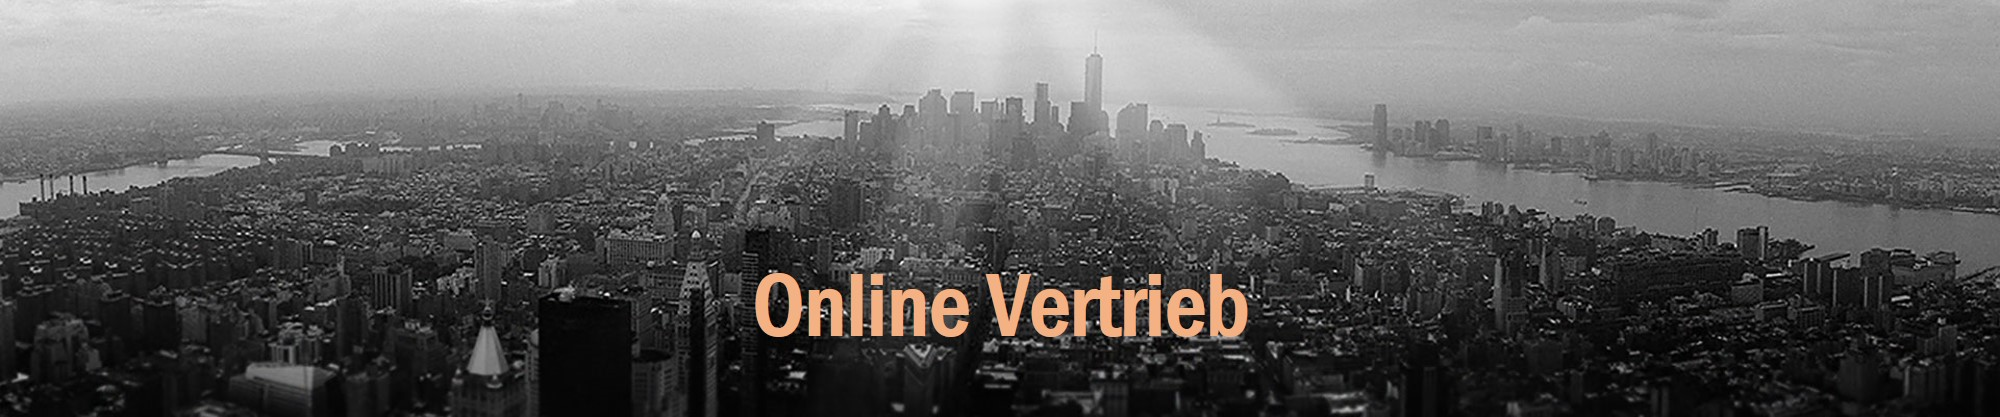 OnlineVertrieb_SonjaDirr_apricot.jpg